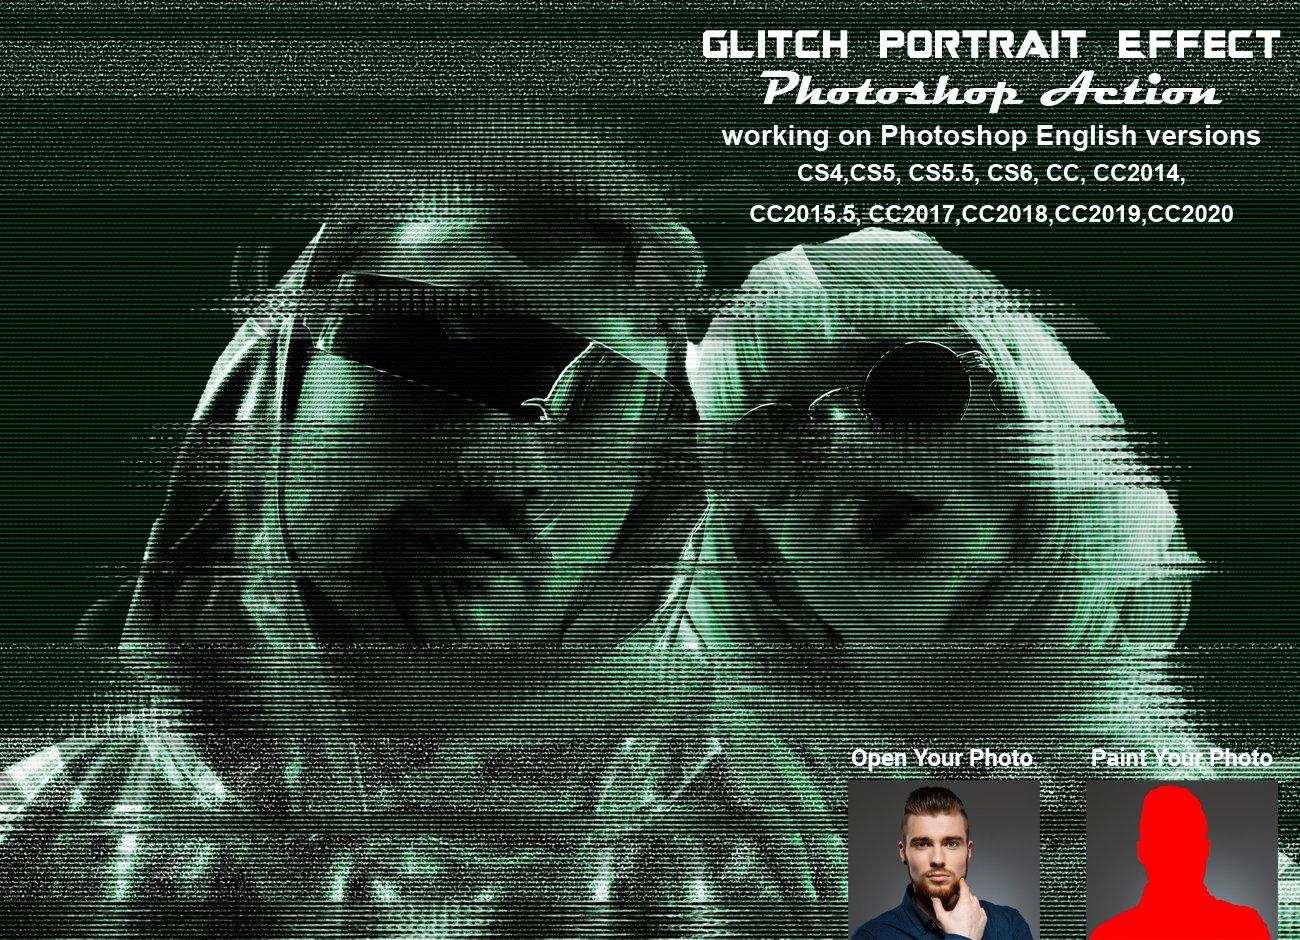 潮流故障风人像照片处理特效PS动作模板 Glitch Portrait Effect PS Action插图